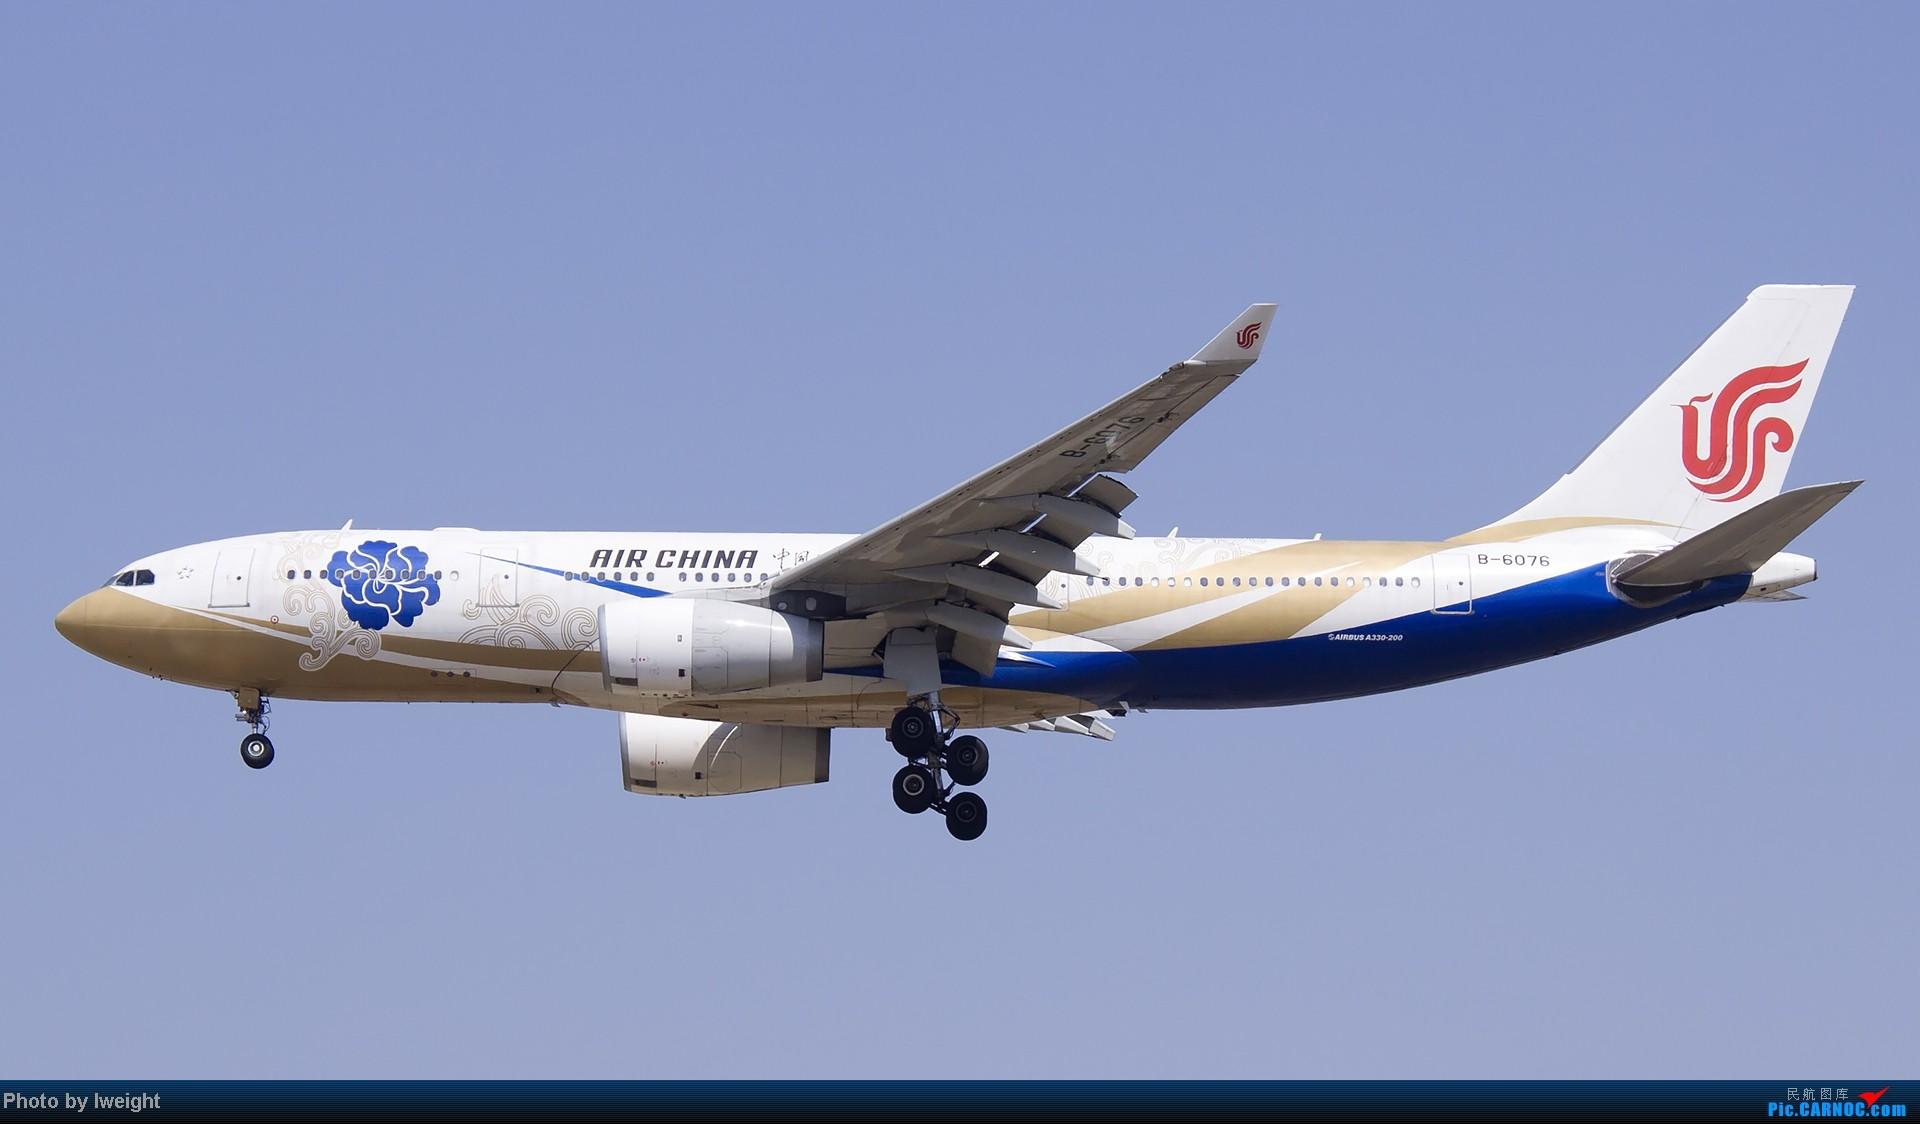 Re:[原创]北京难得的好天气,收获多种机型和彩绘,遗憾的是再次错过卡航巴塞罗那彩绘 AIRBUS A330-200 B-6076 中国北京首都机场